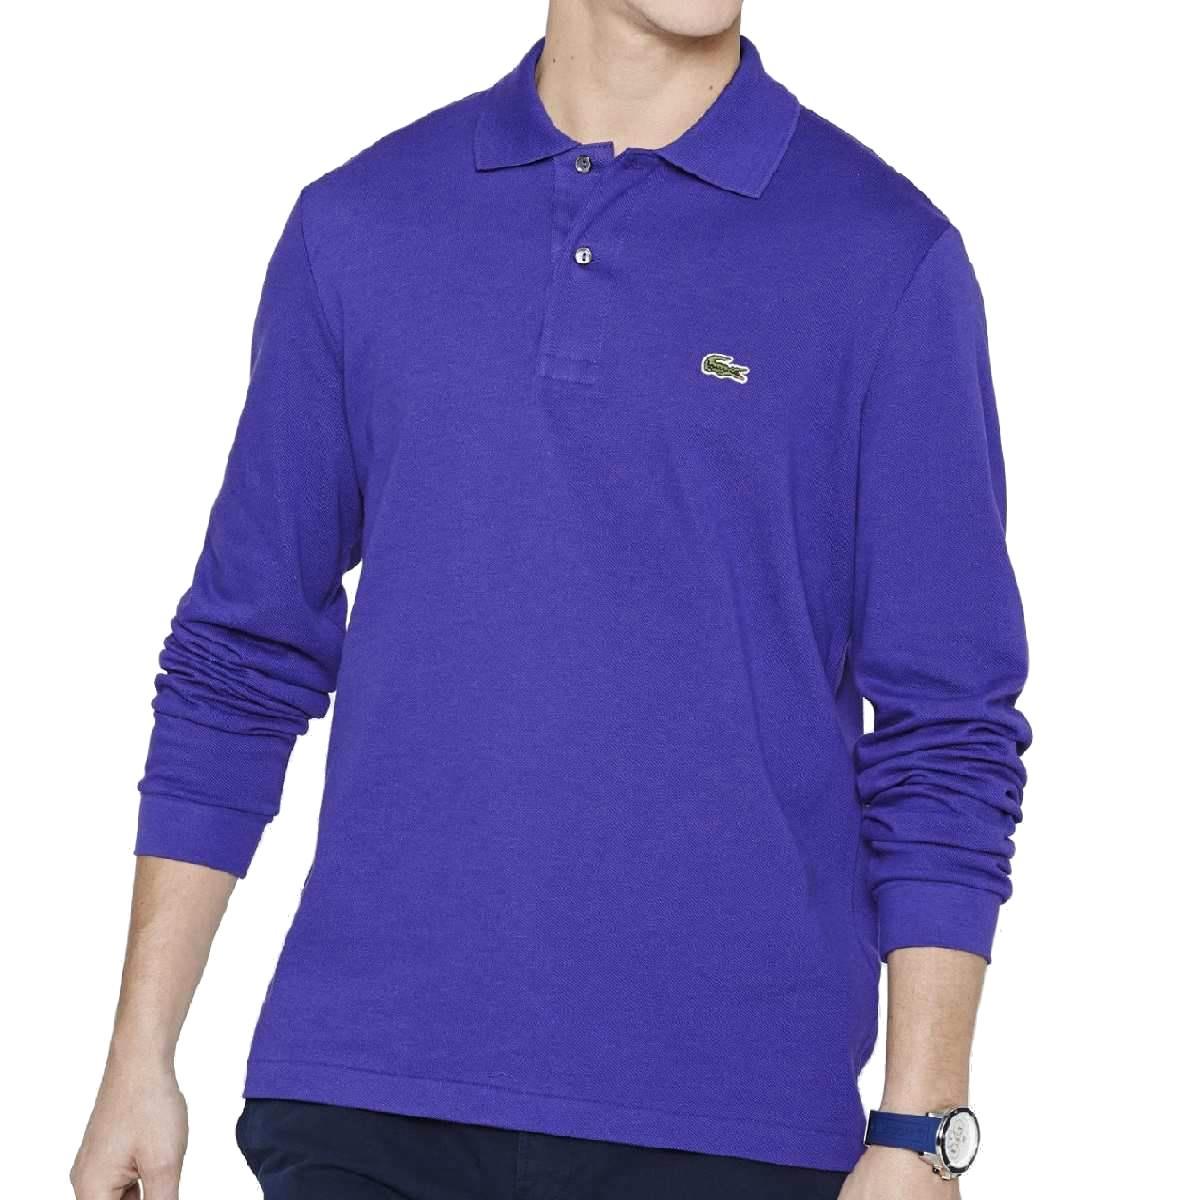 original lacoste polo shirt price philippines